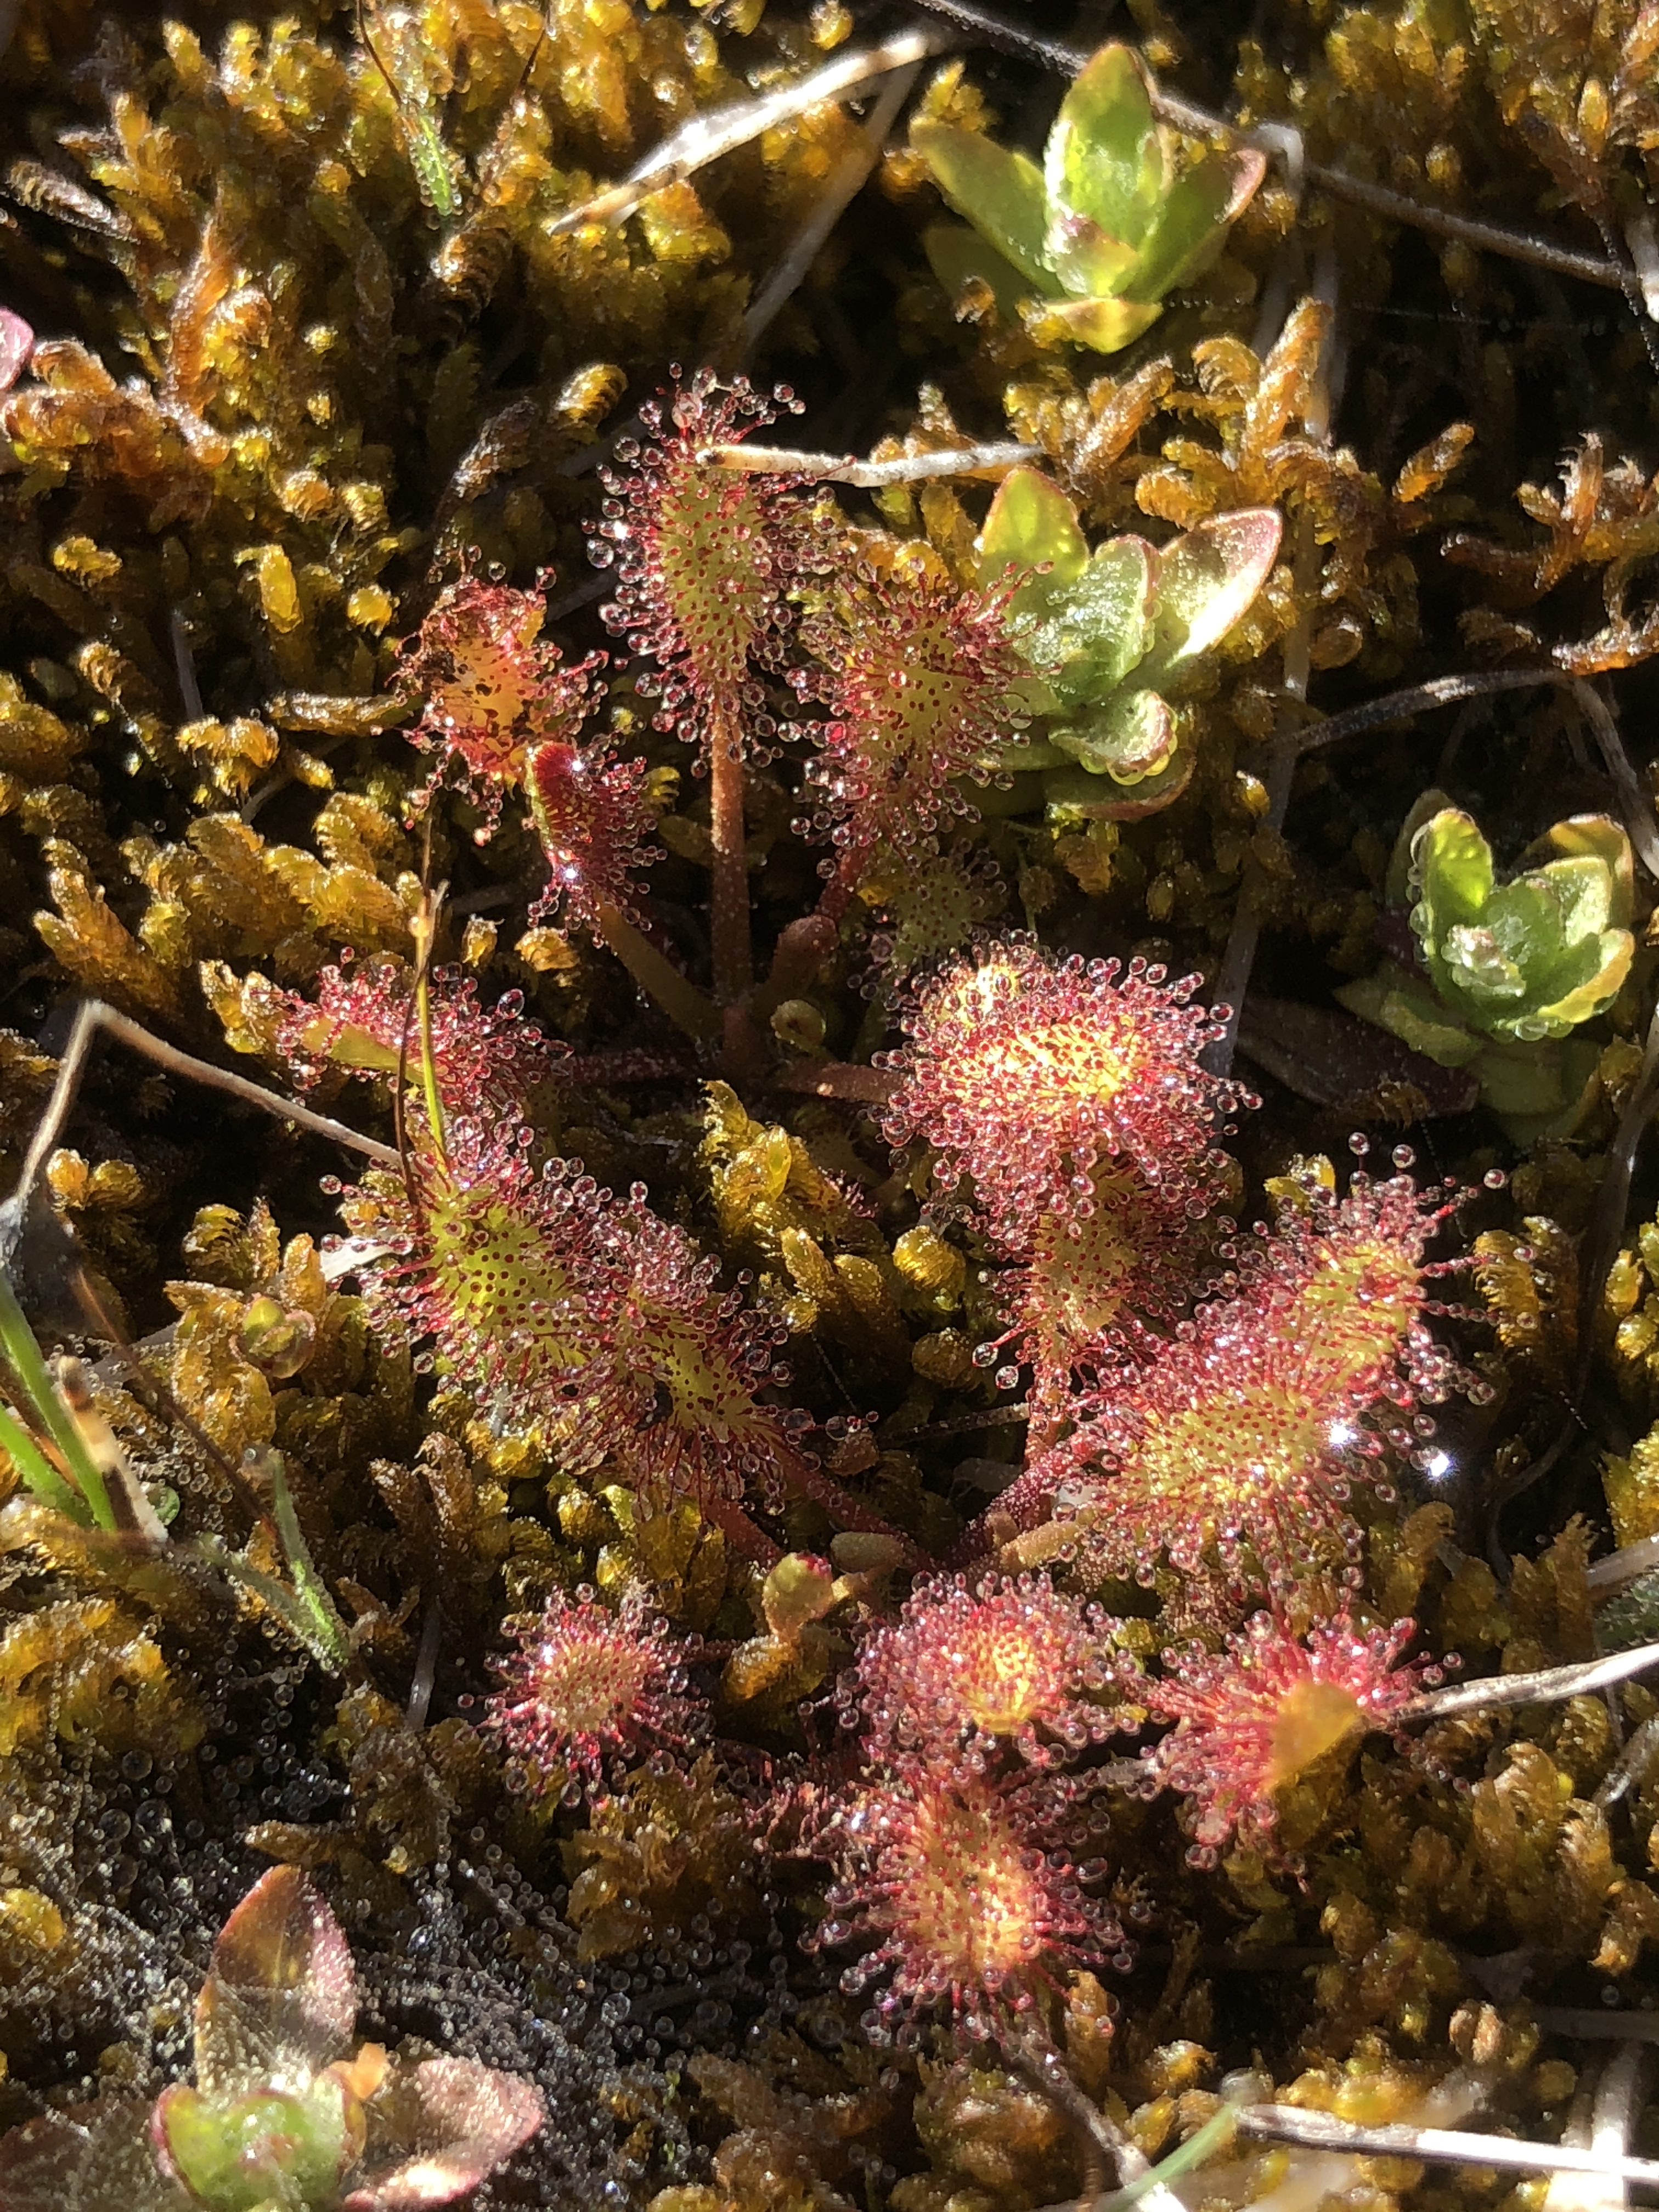 1_Drosera_rotundifolia